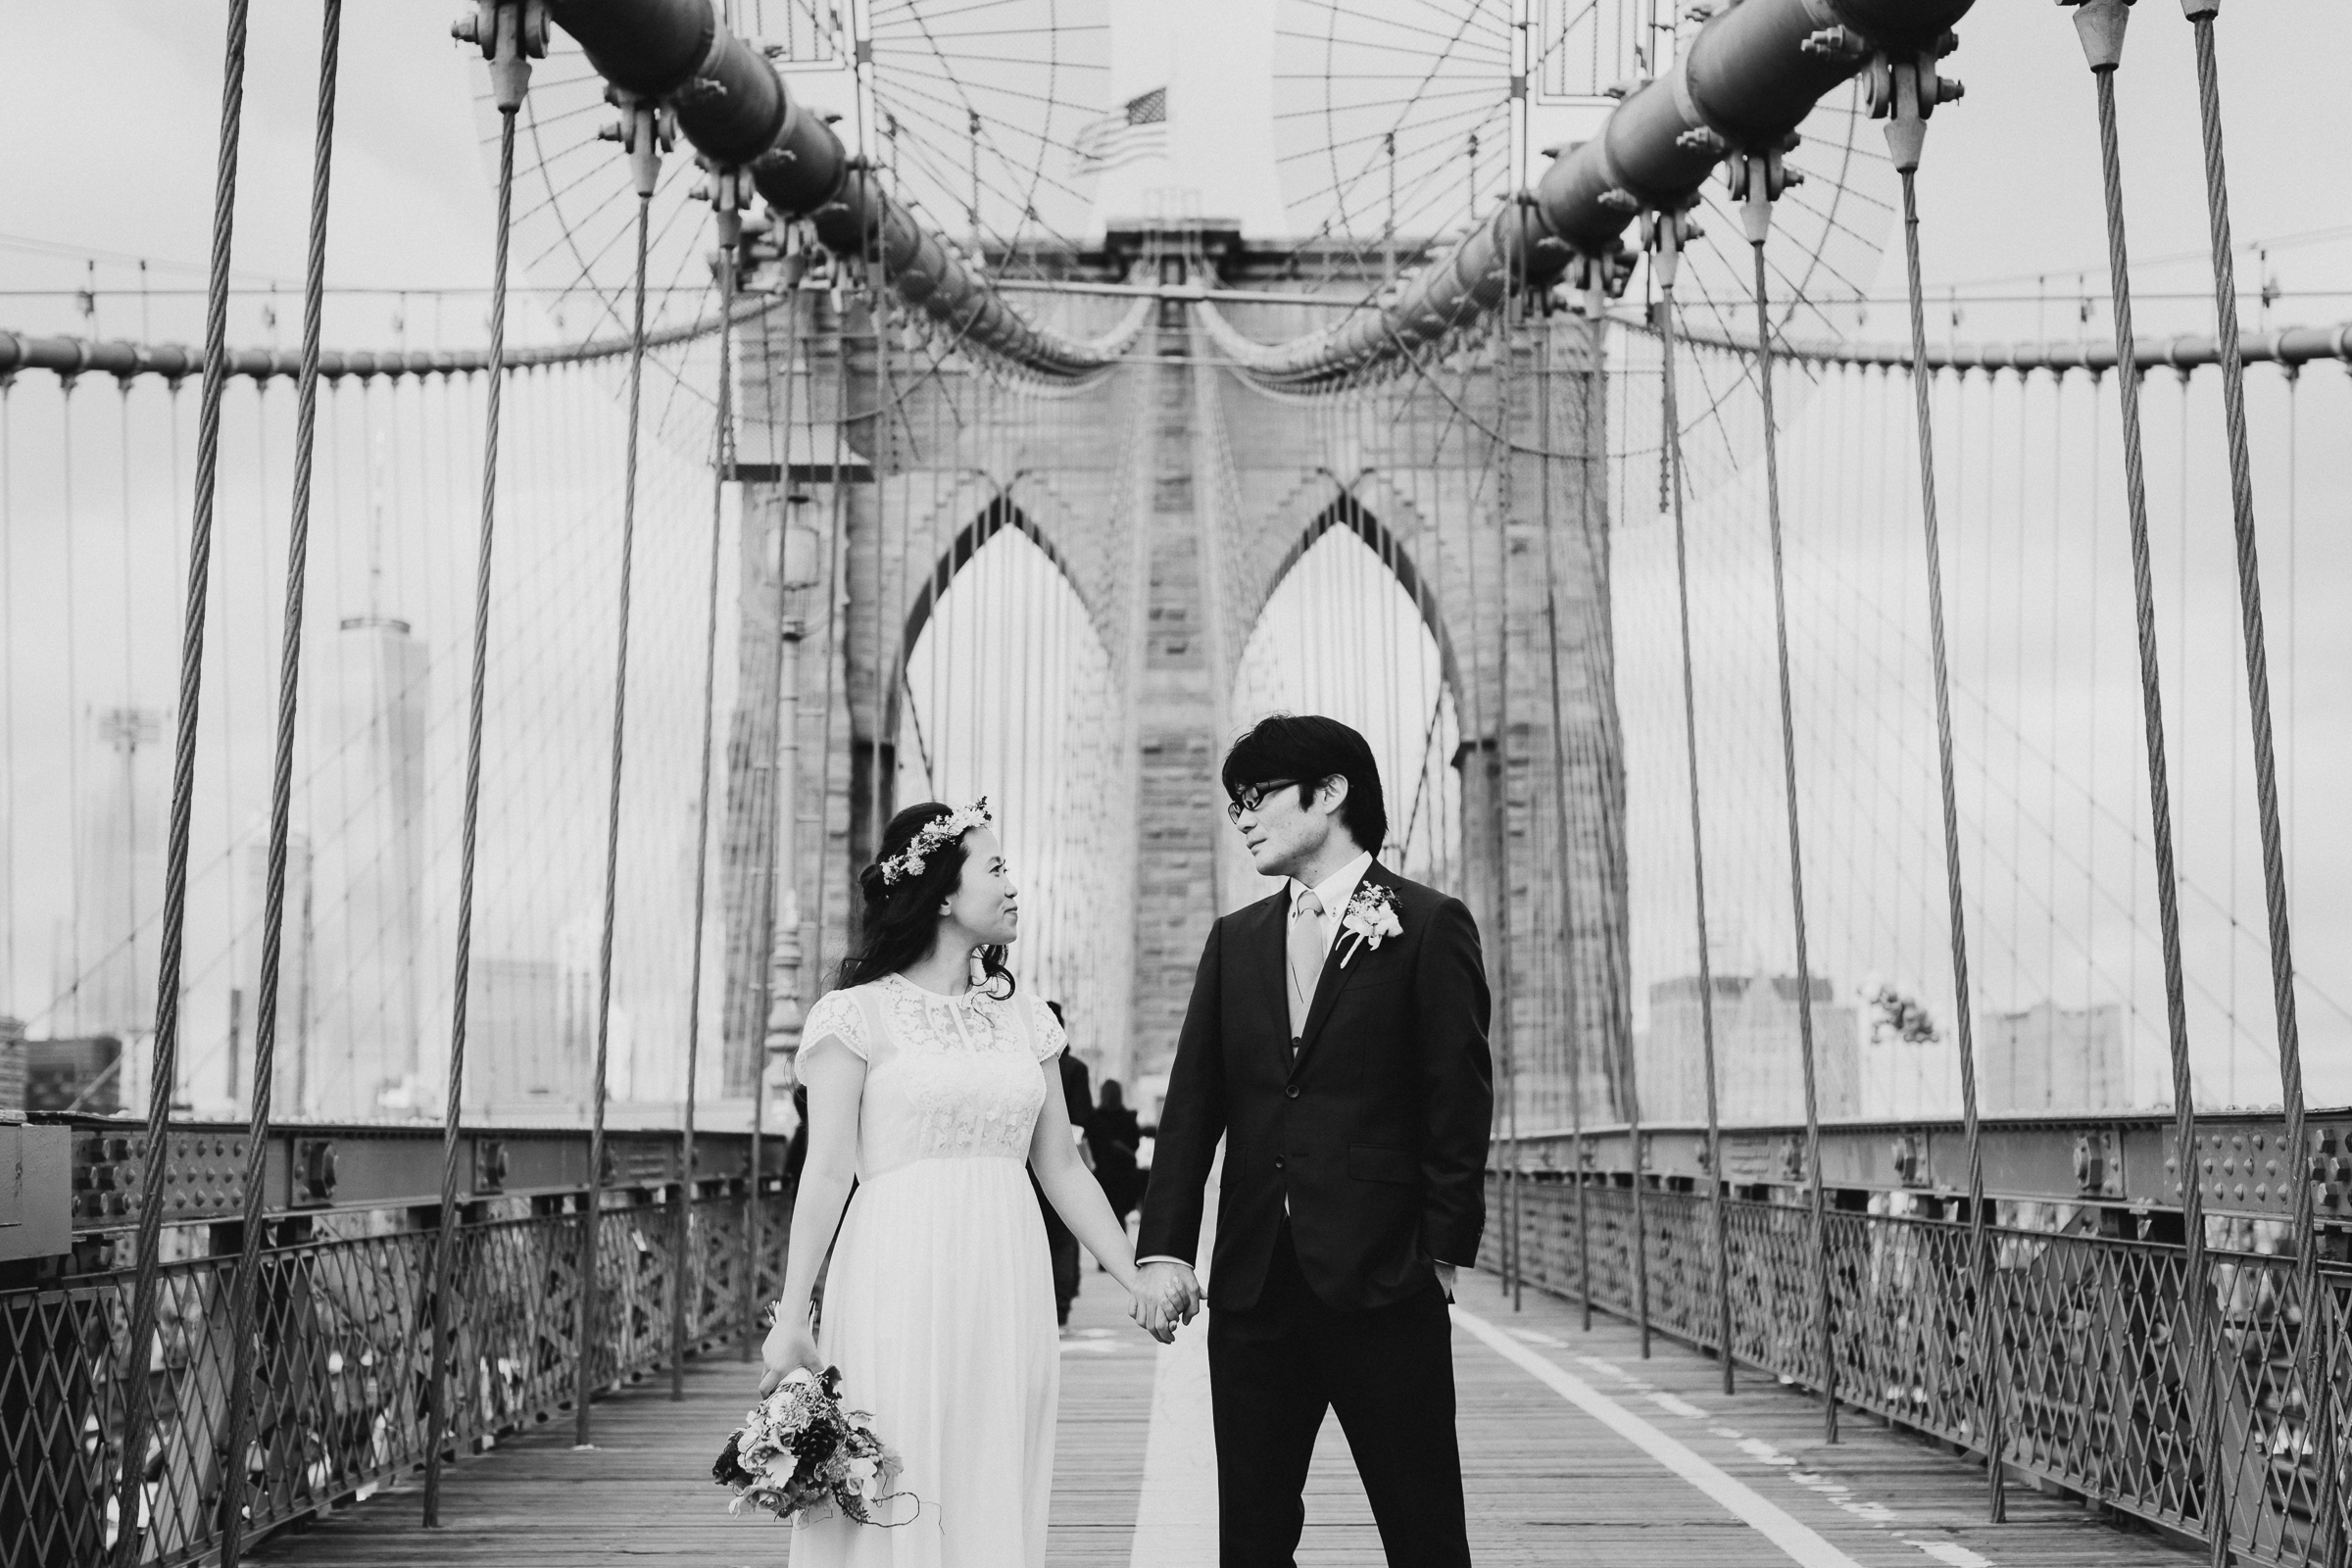 Central-Park-Brooklyn-Bridge-Dumbo-NYC-Documentary-Wedding-Photographer-29.jpg